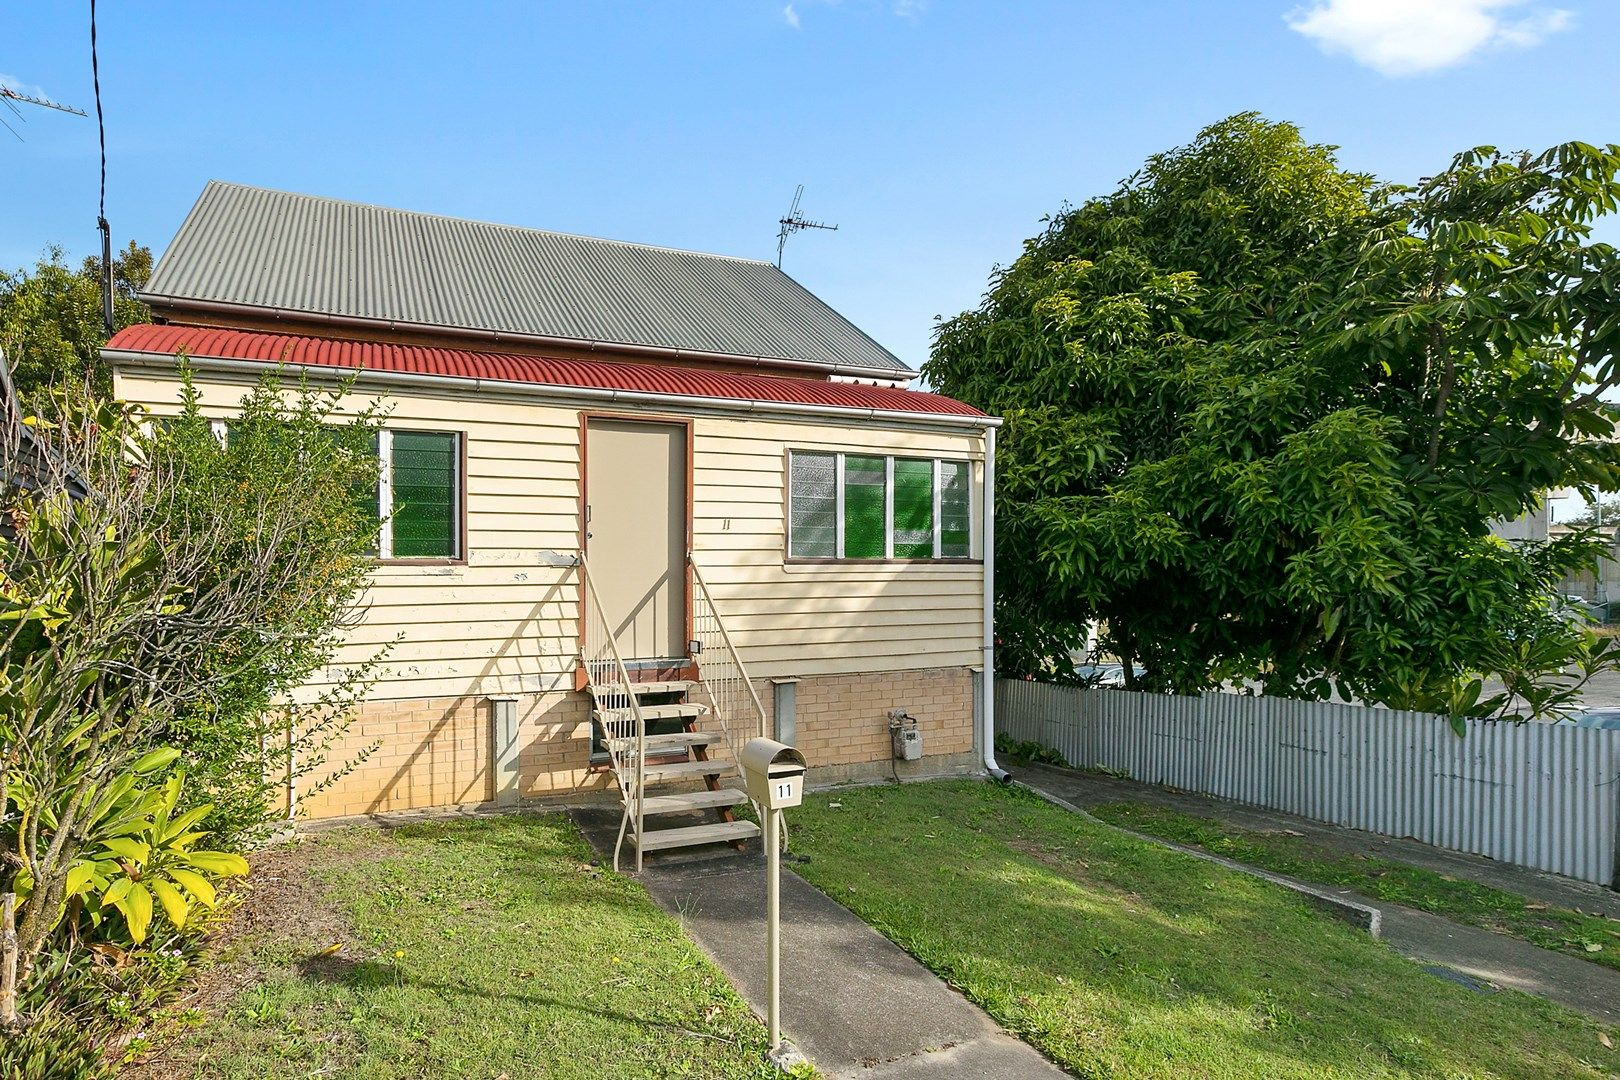 11 Harrogate Street, Woolloongabba QLD 4102, Image 0